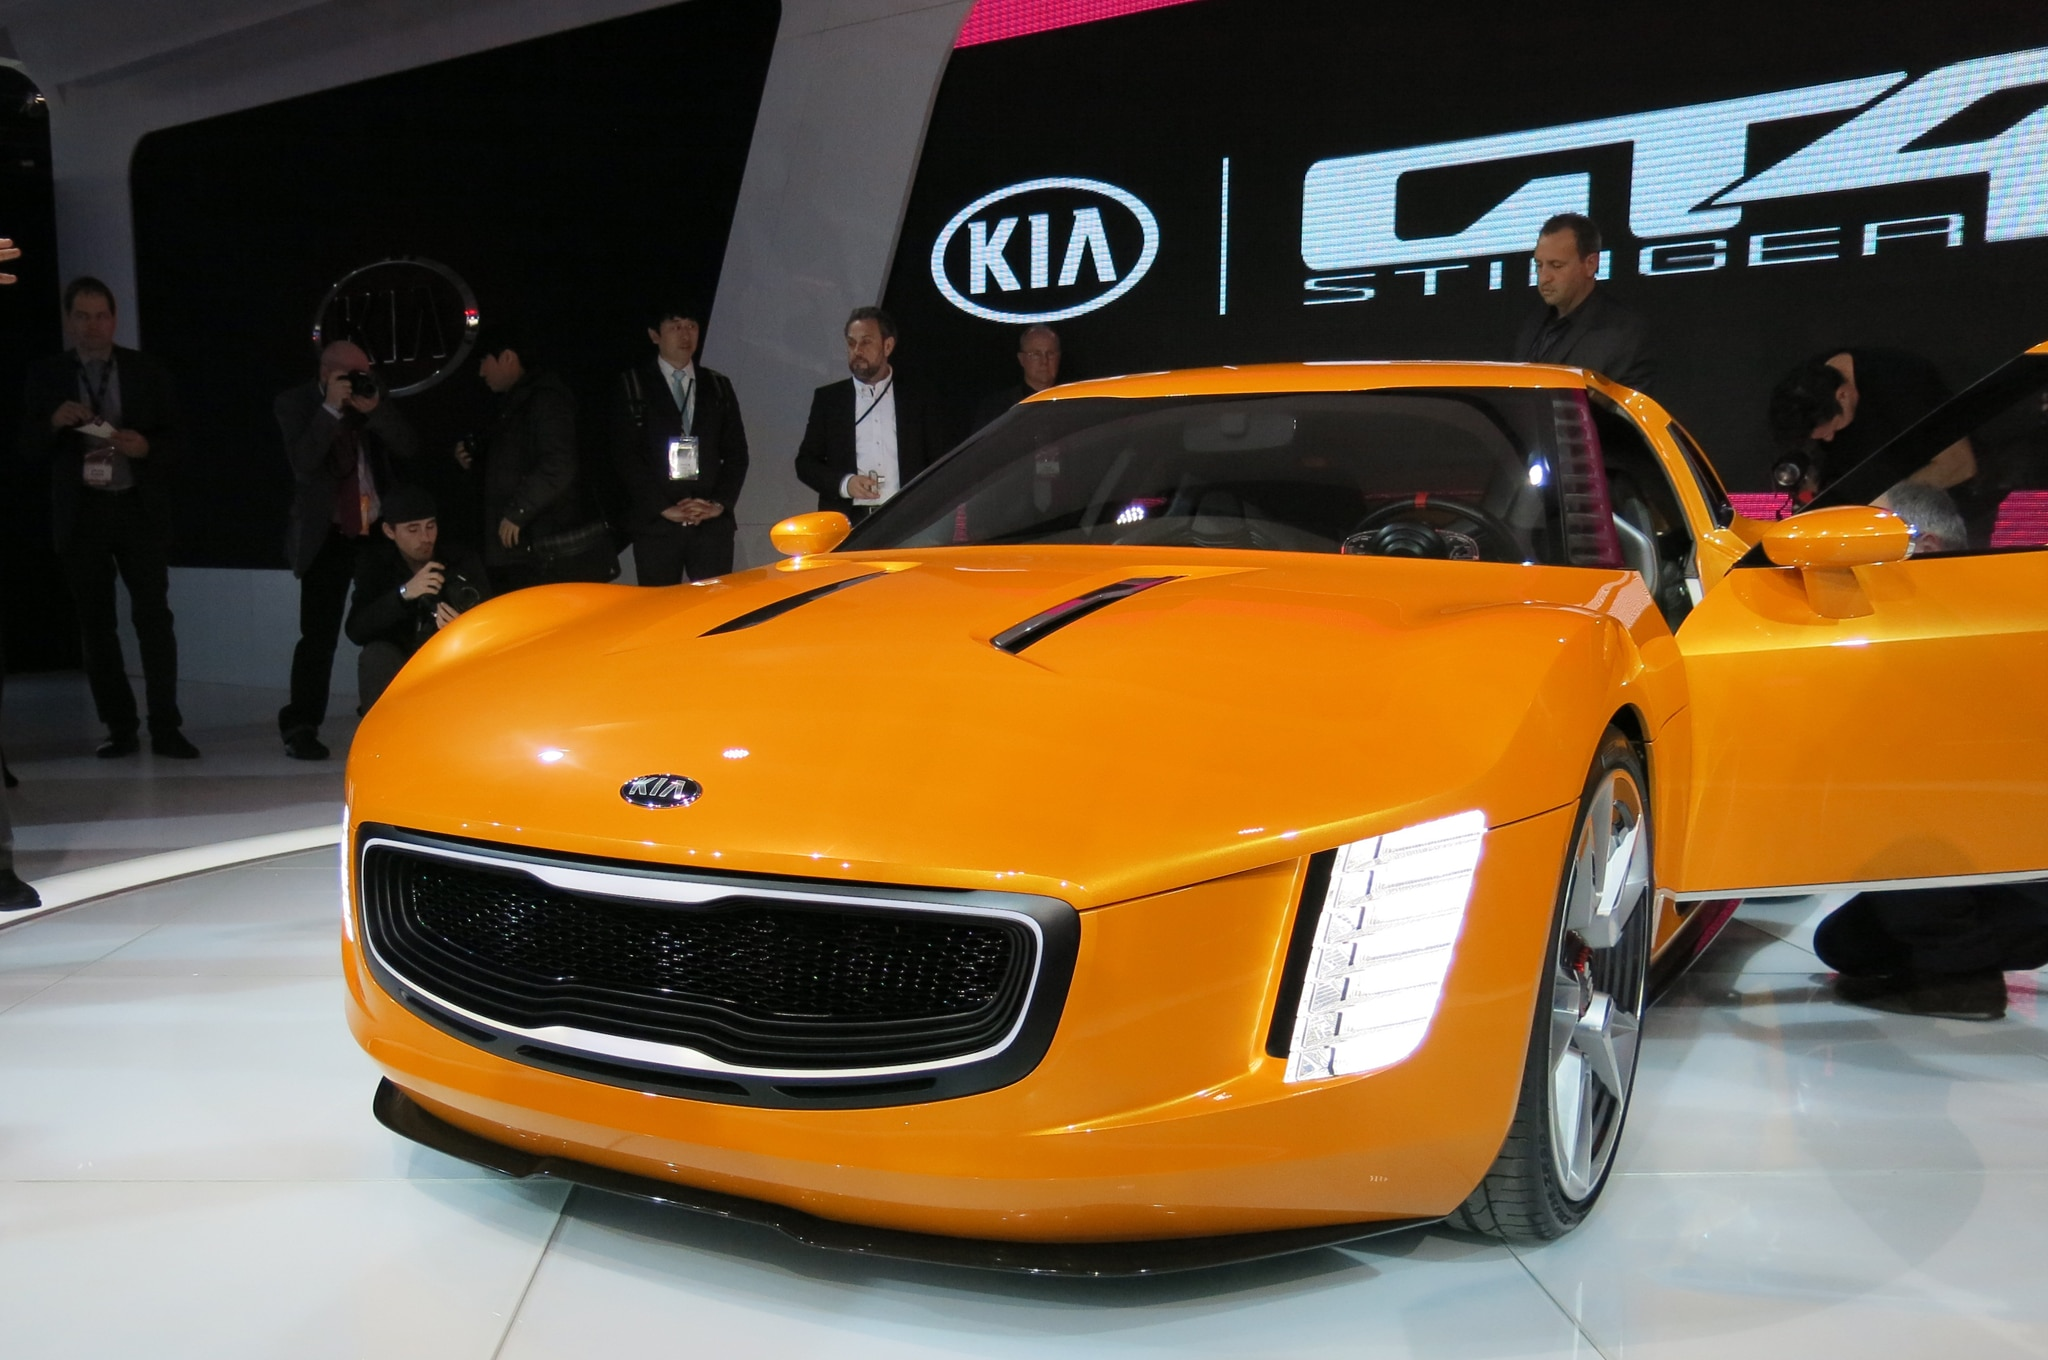 Kia Gt4 Stinger Concept Front Close